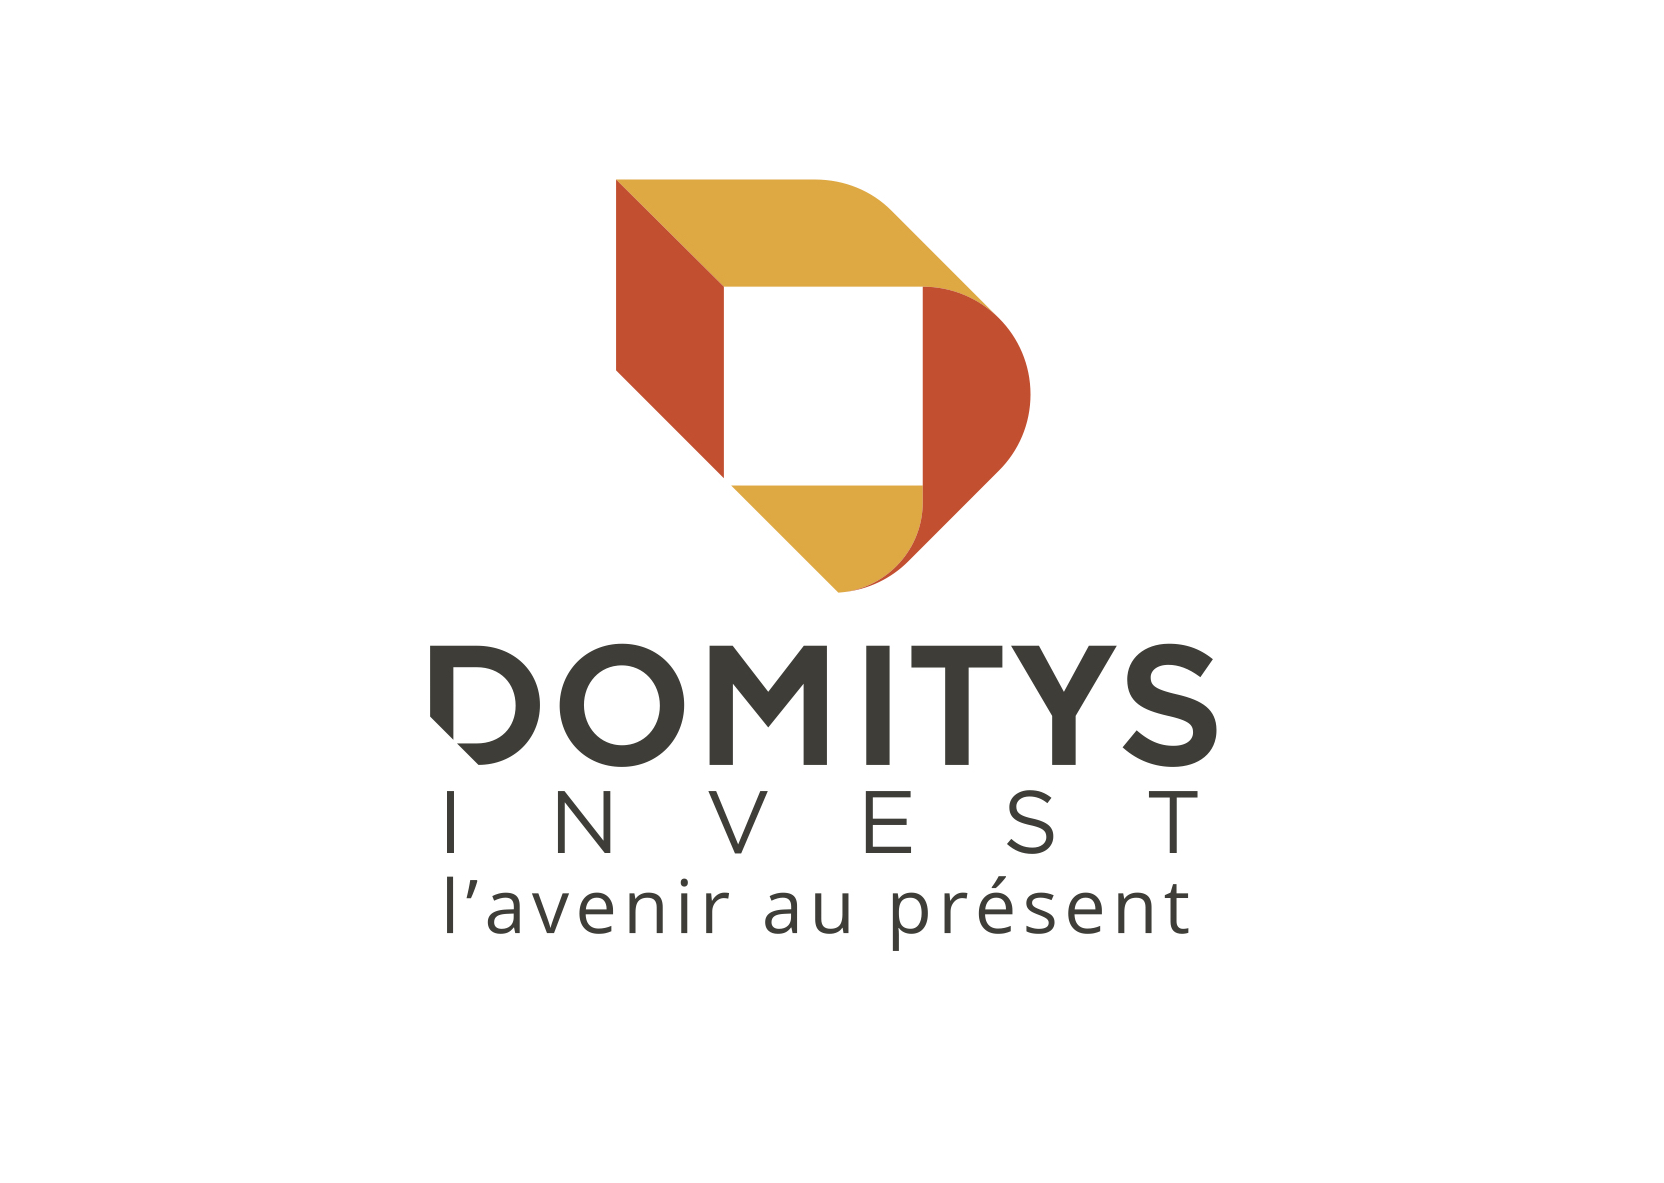 LOGO-DOMITYS.jpg